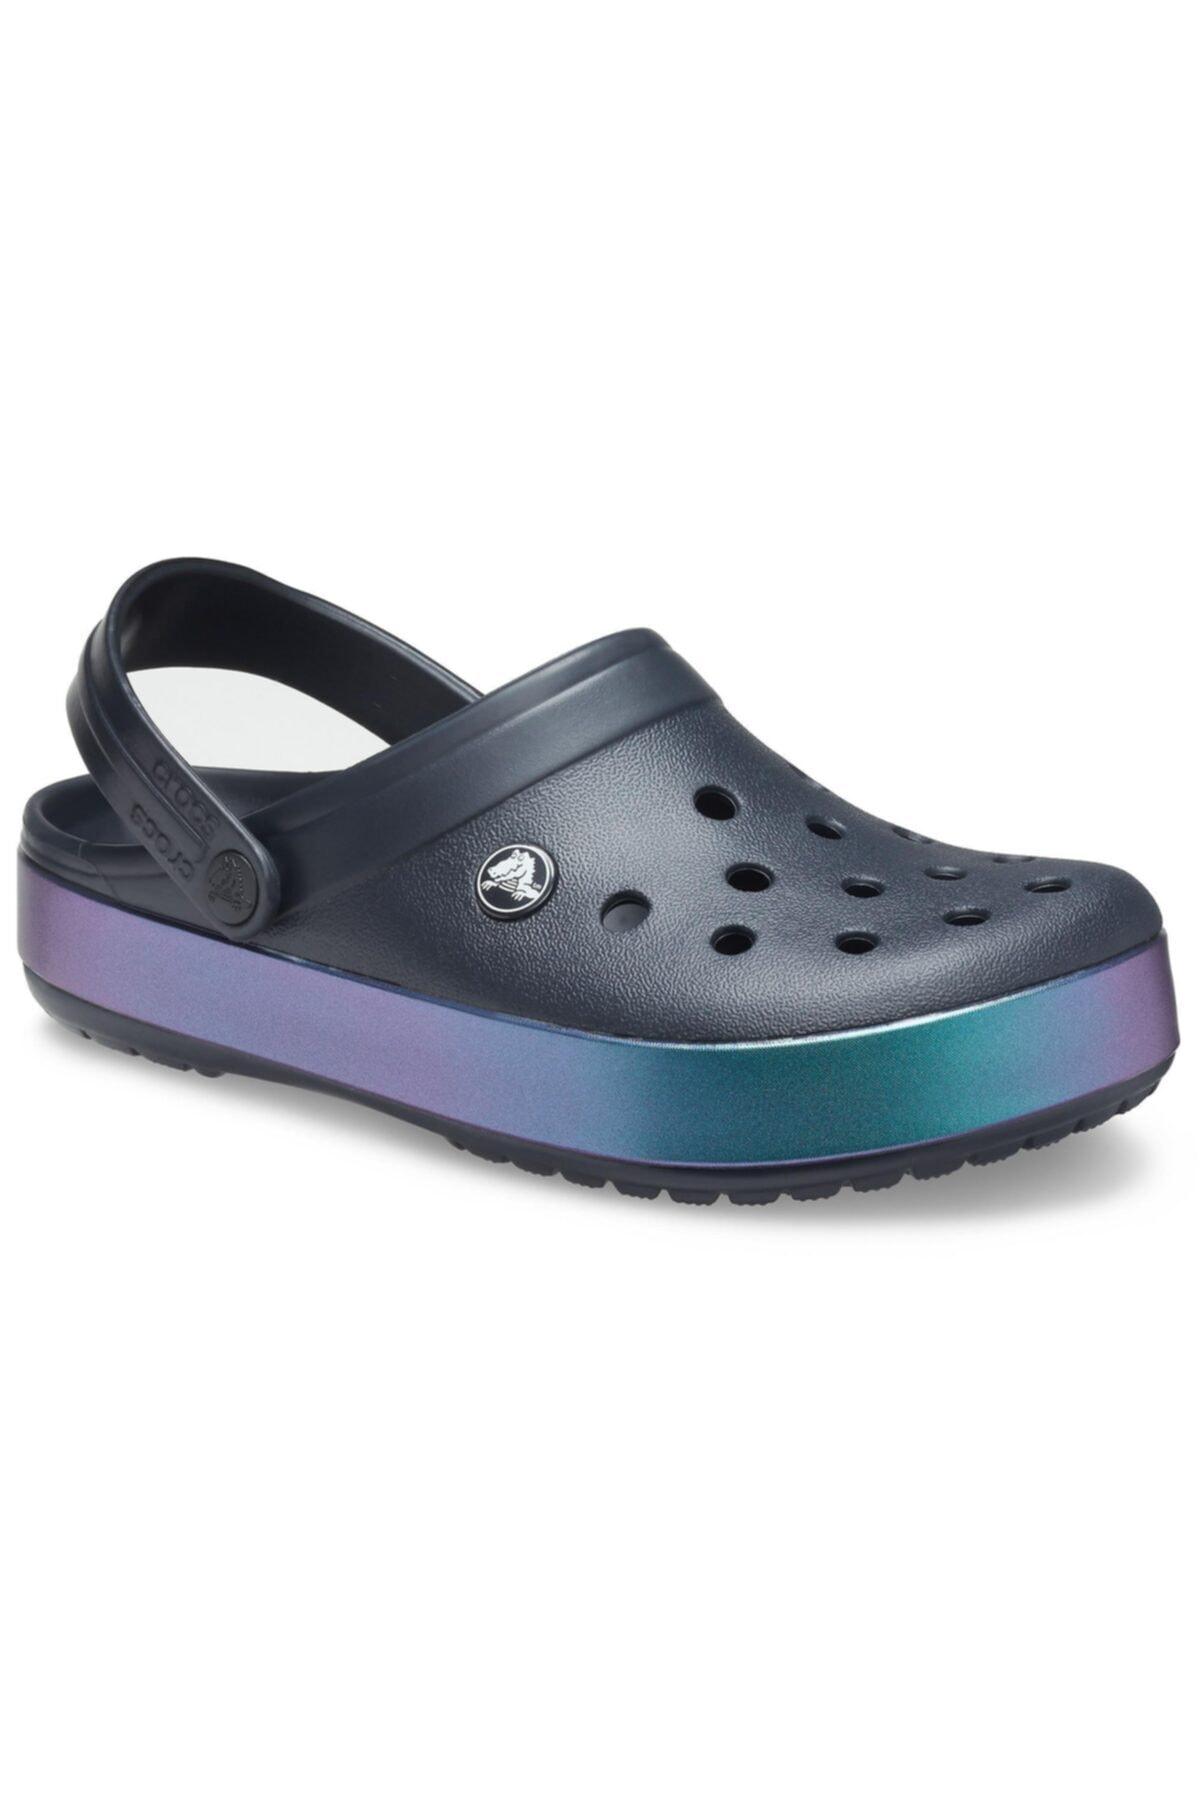 Crocs Irıdescent Band Spor Terlik Sandalet 1